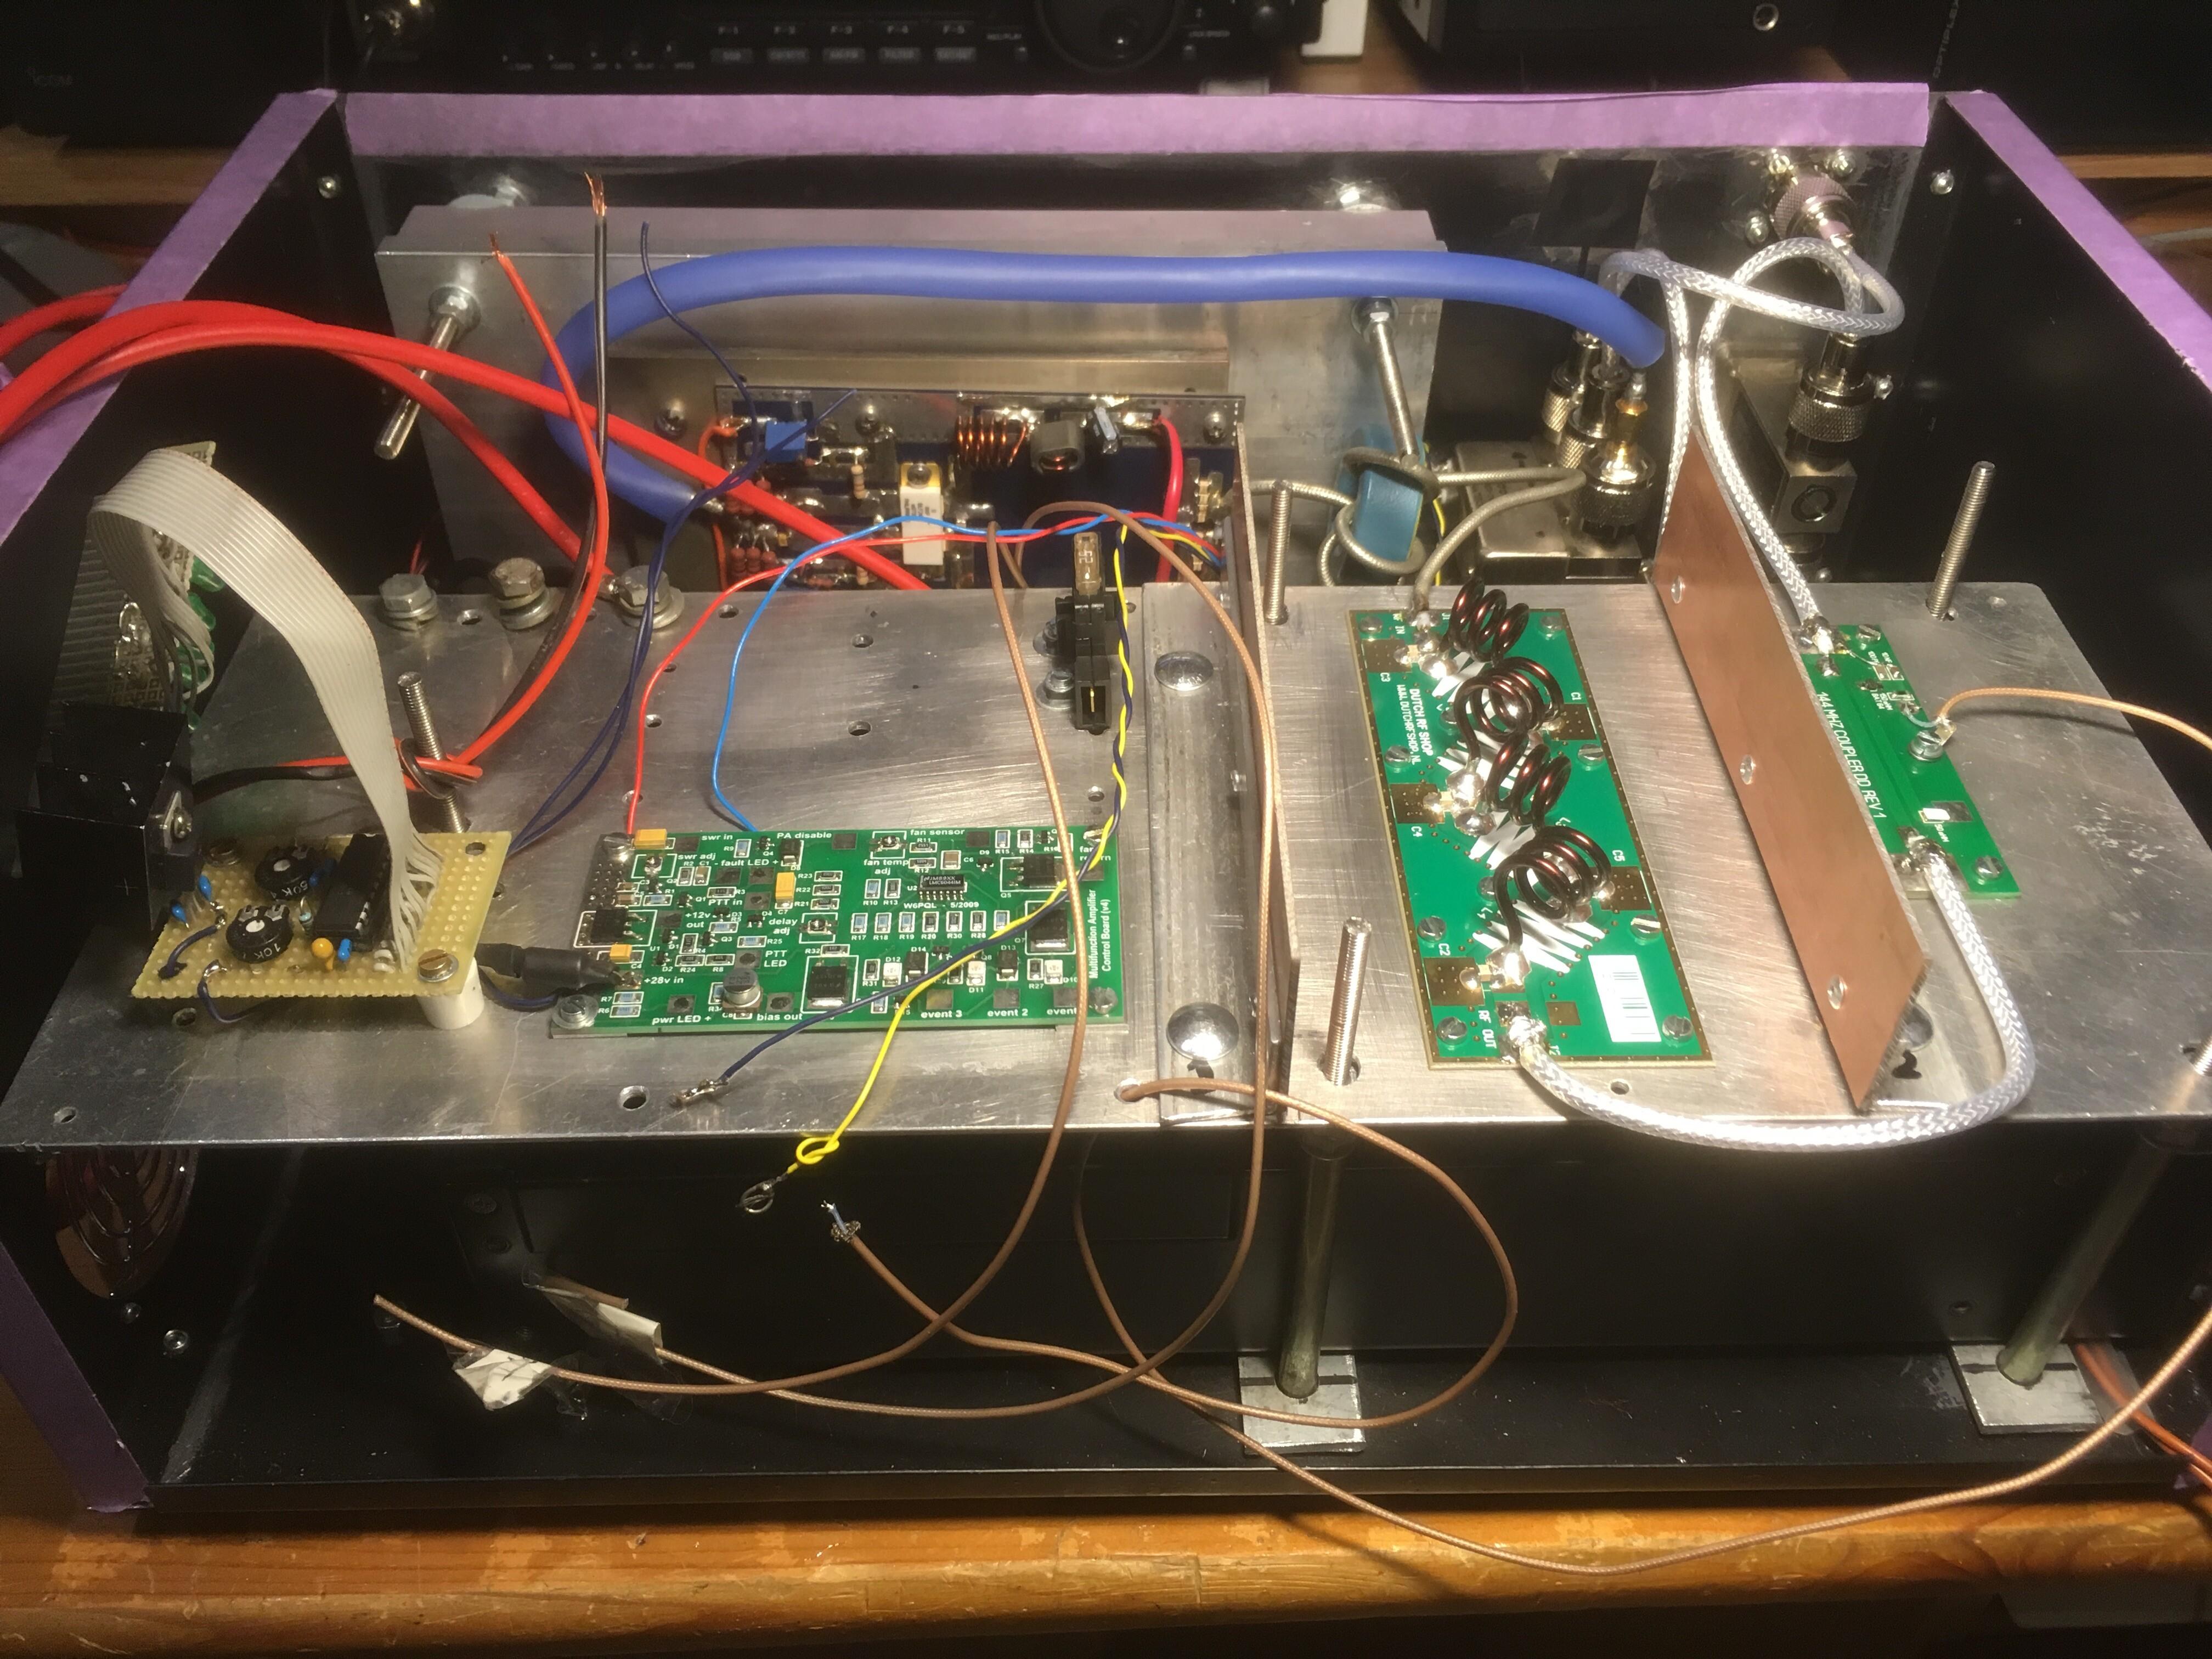 Powermeting LM3915, VK4DD BLF248 PA, W6PQL Solid-state Switch, Dutch RF Shop Low Pass Filter -60dB voor 144 – 146 MHz, VK4DD 144 – 146 MHz Coupler, W6PQF Multifunctional Amplifier Control Board en coaxrelais van PE1ORG